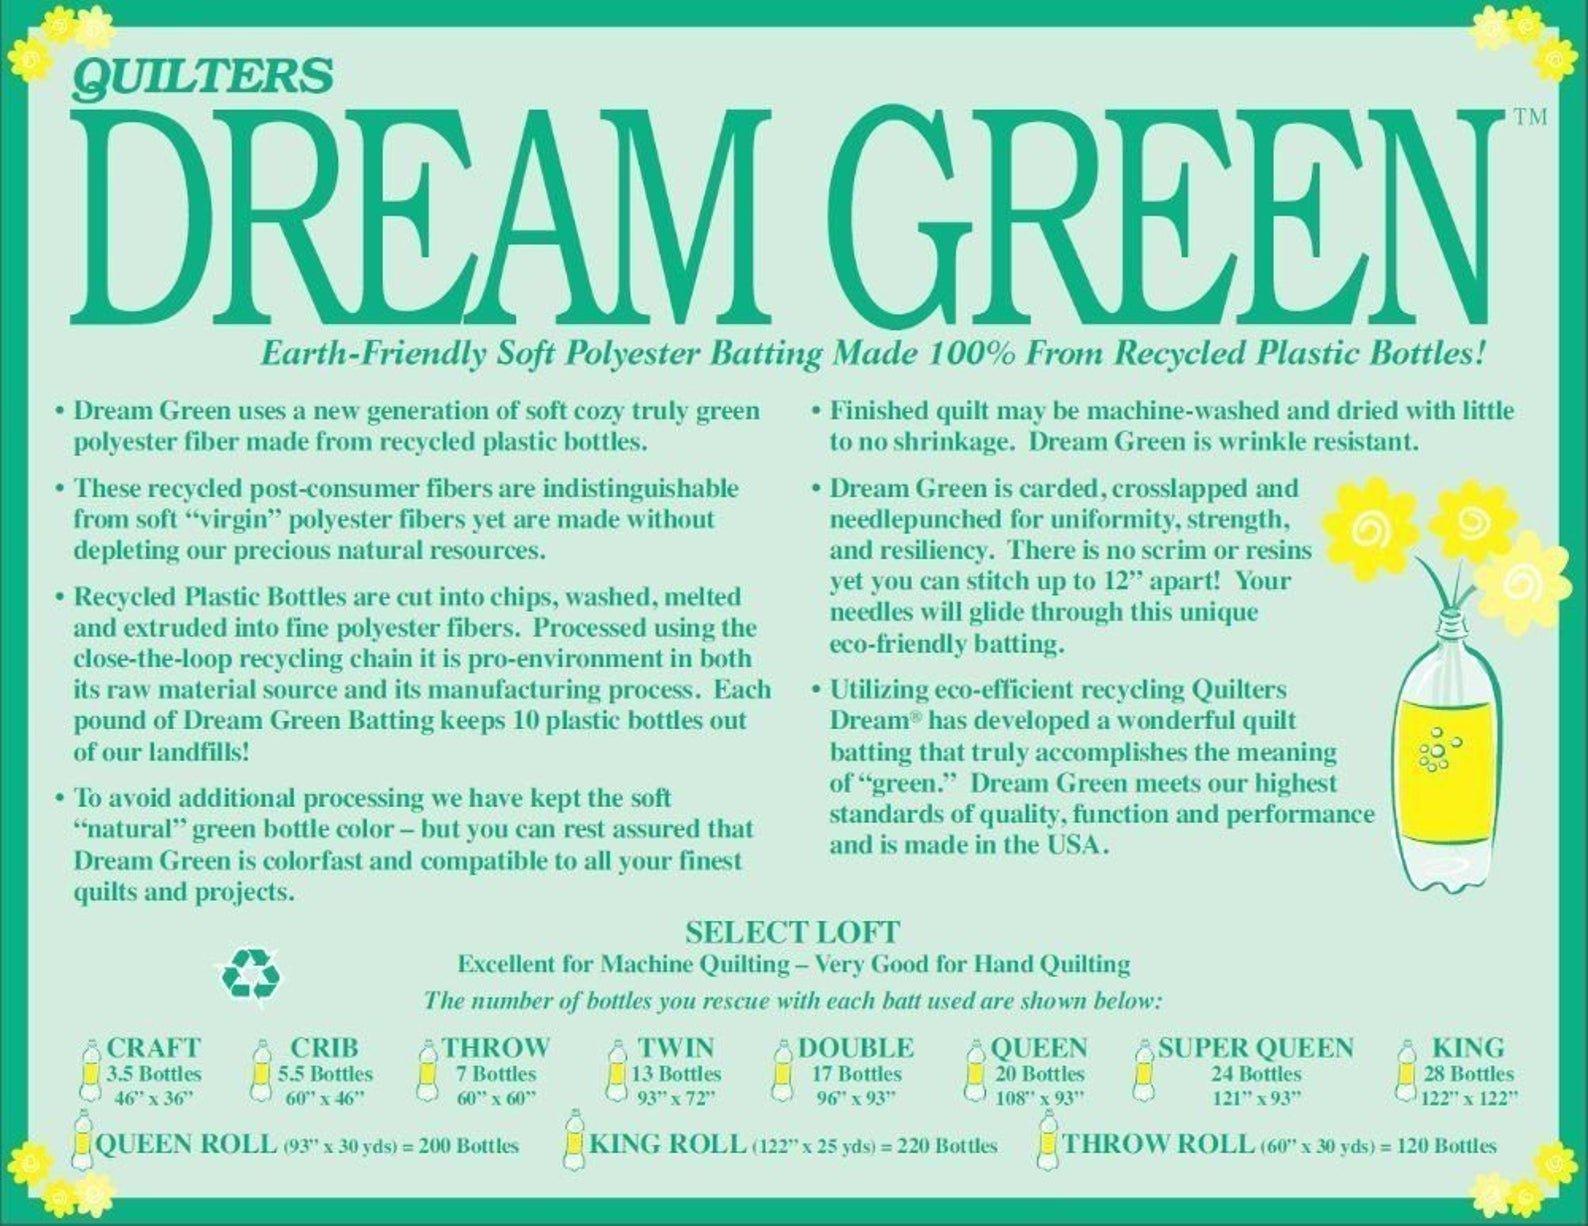 Quilters Dream Green Batting - Select Loft